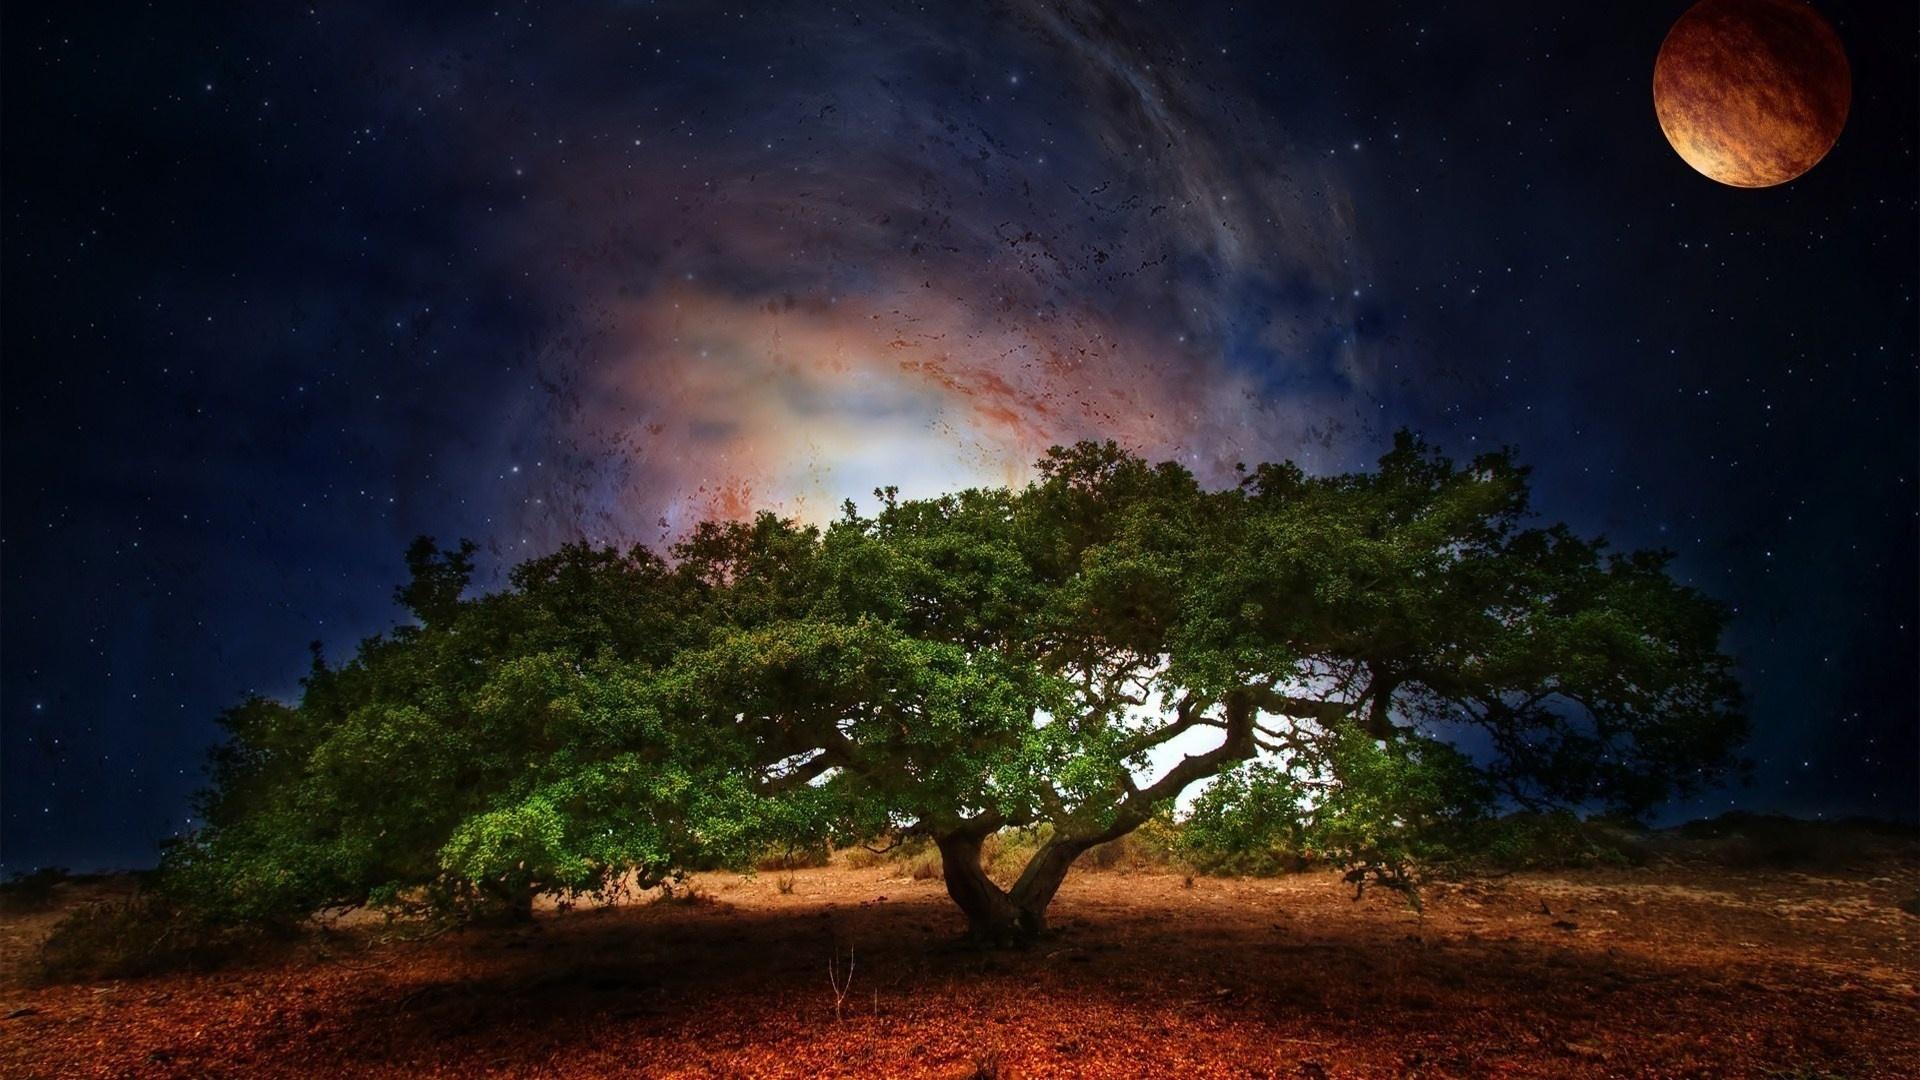 Tree art planet light fantasy sci-fi galaxy sky stars ...